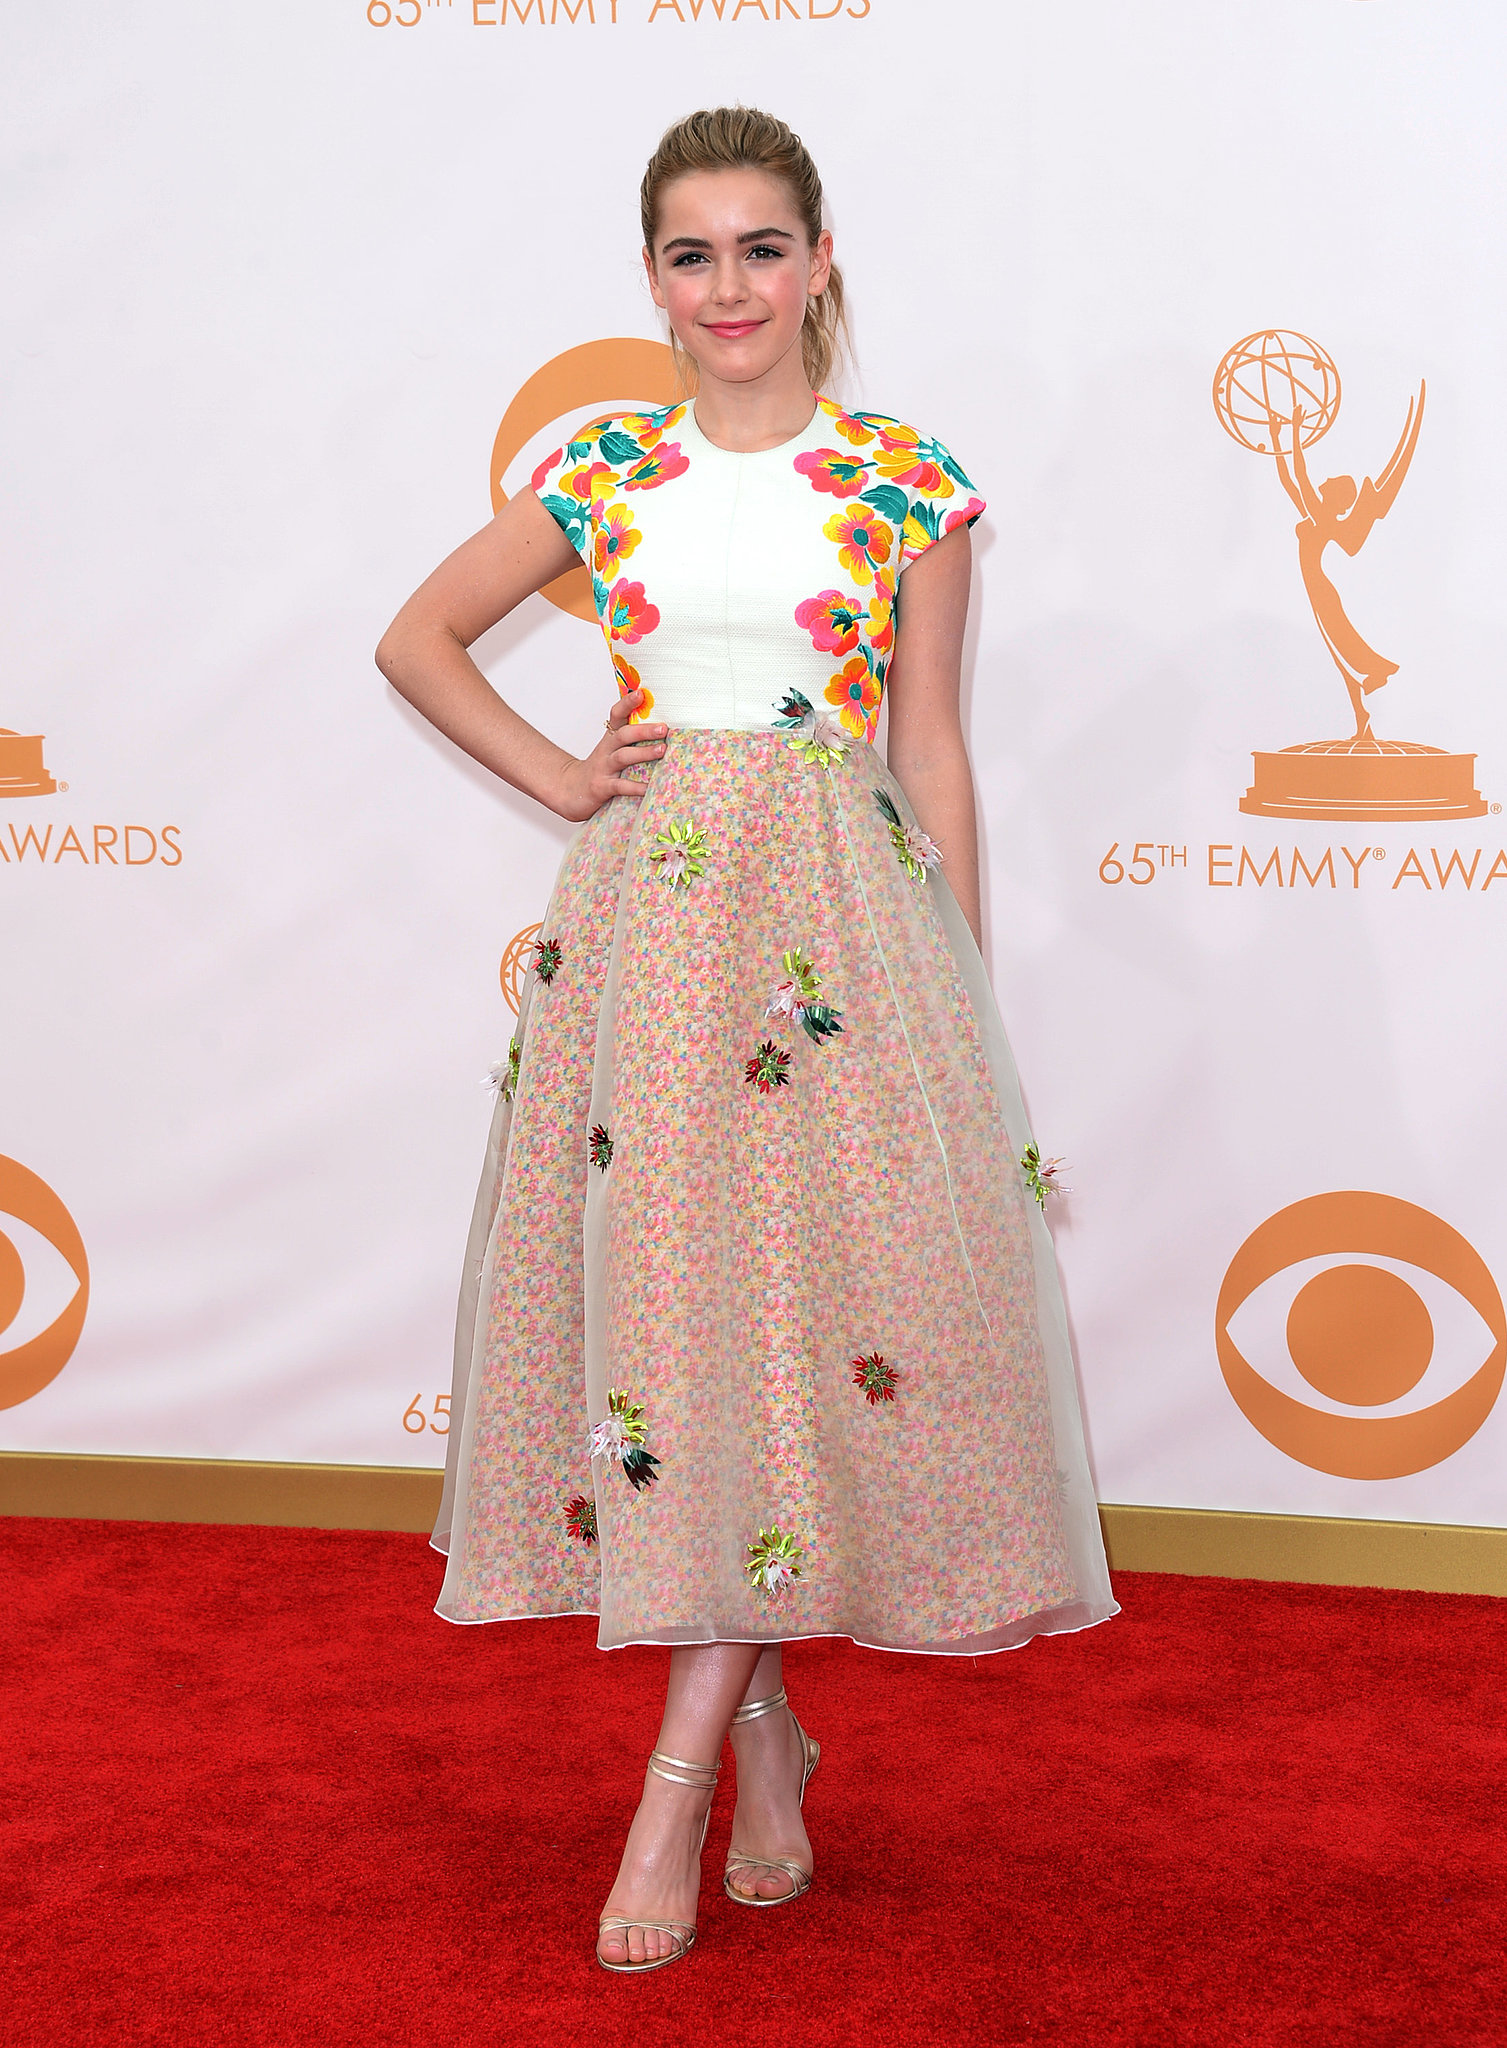 Kiernan Shipka attended the Emmy Awards.